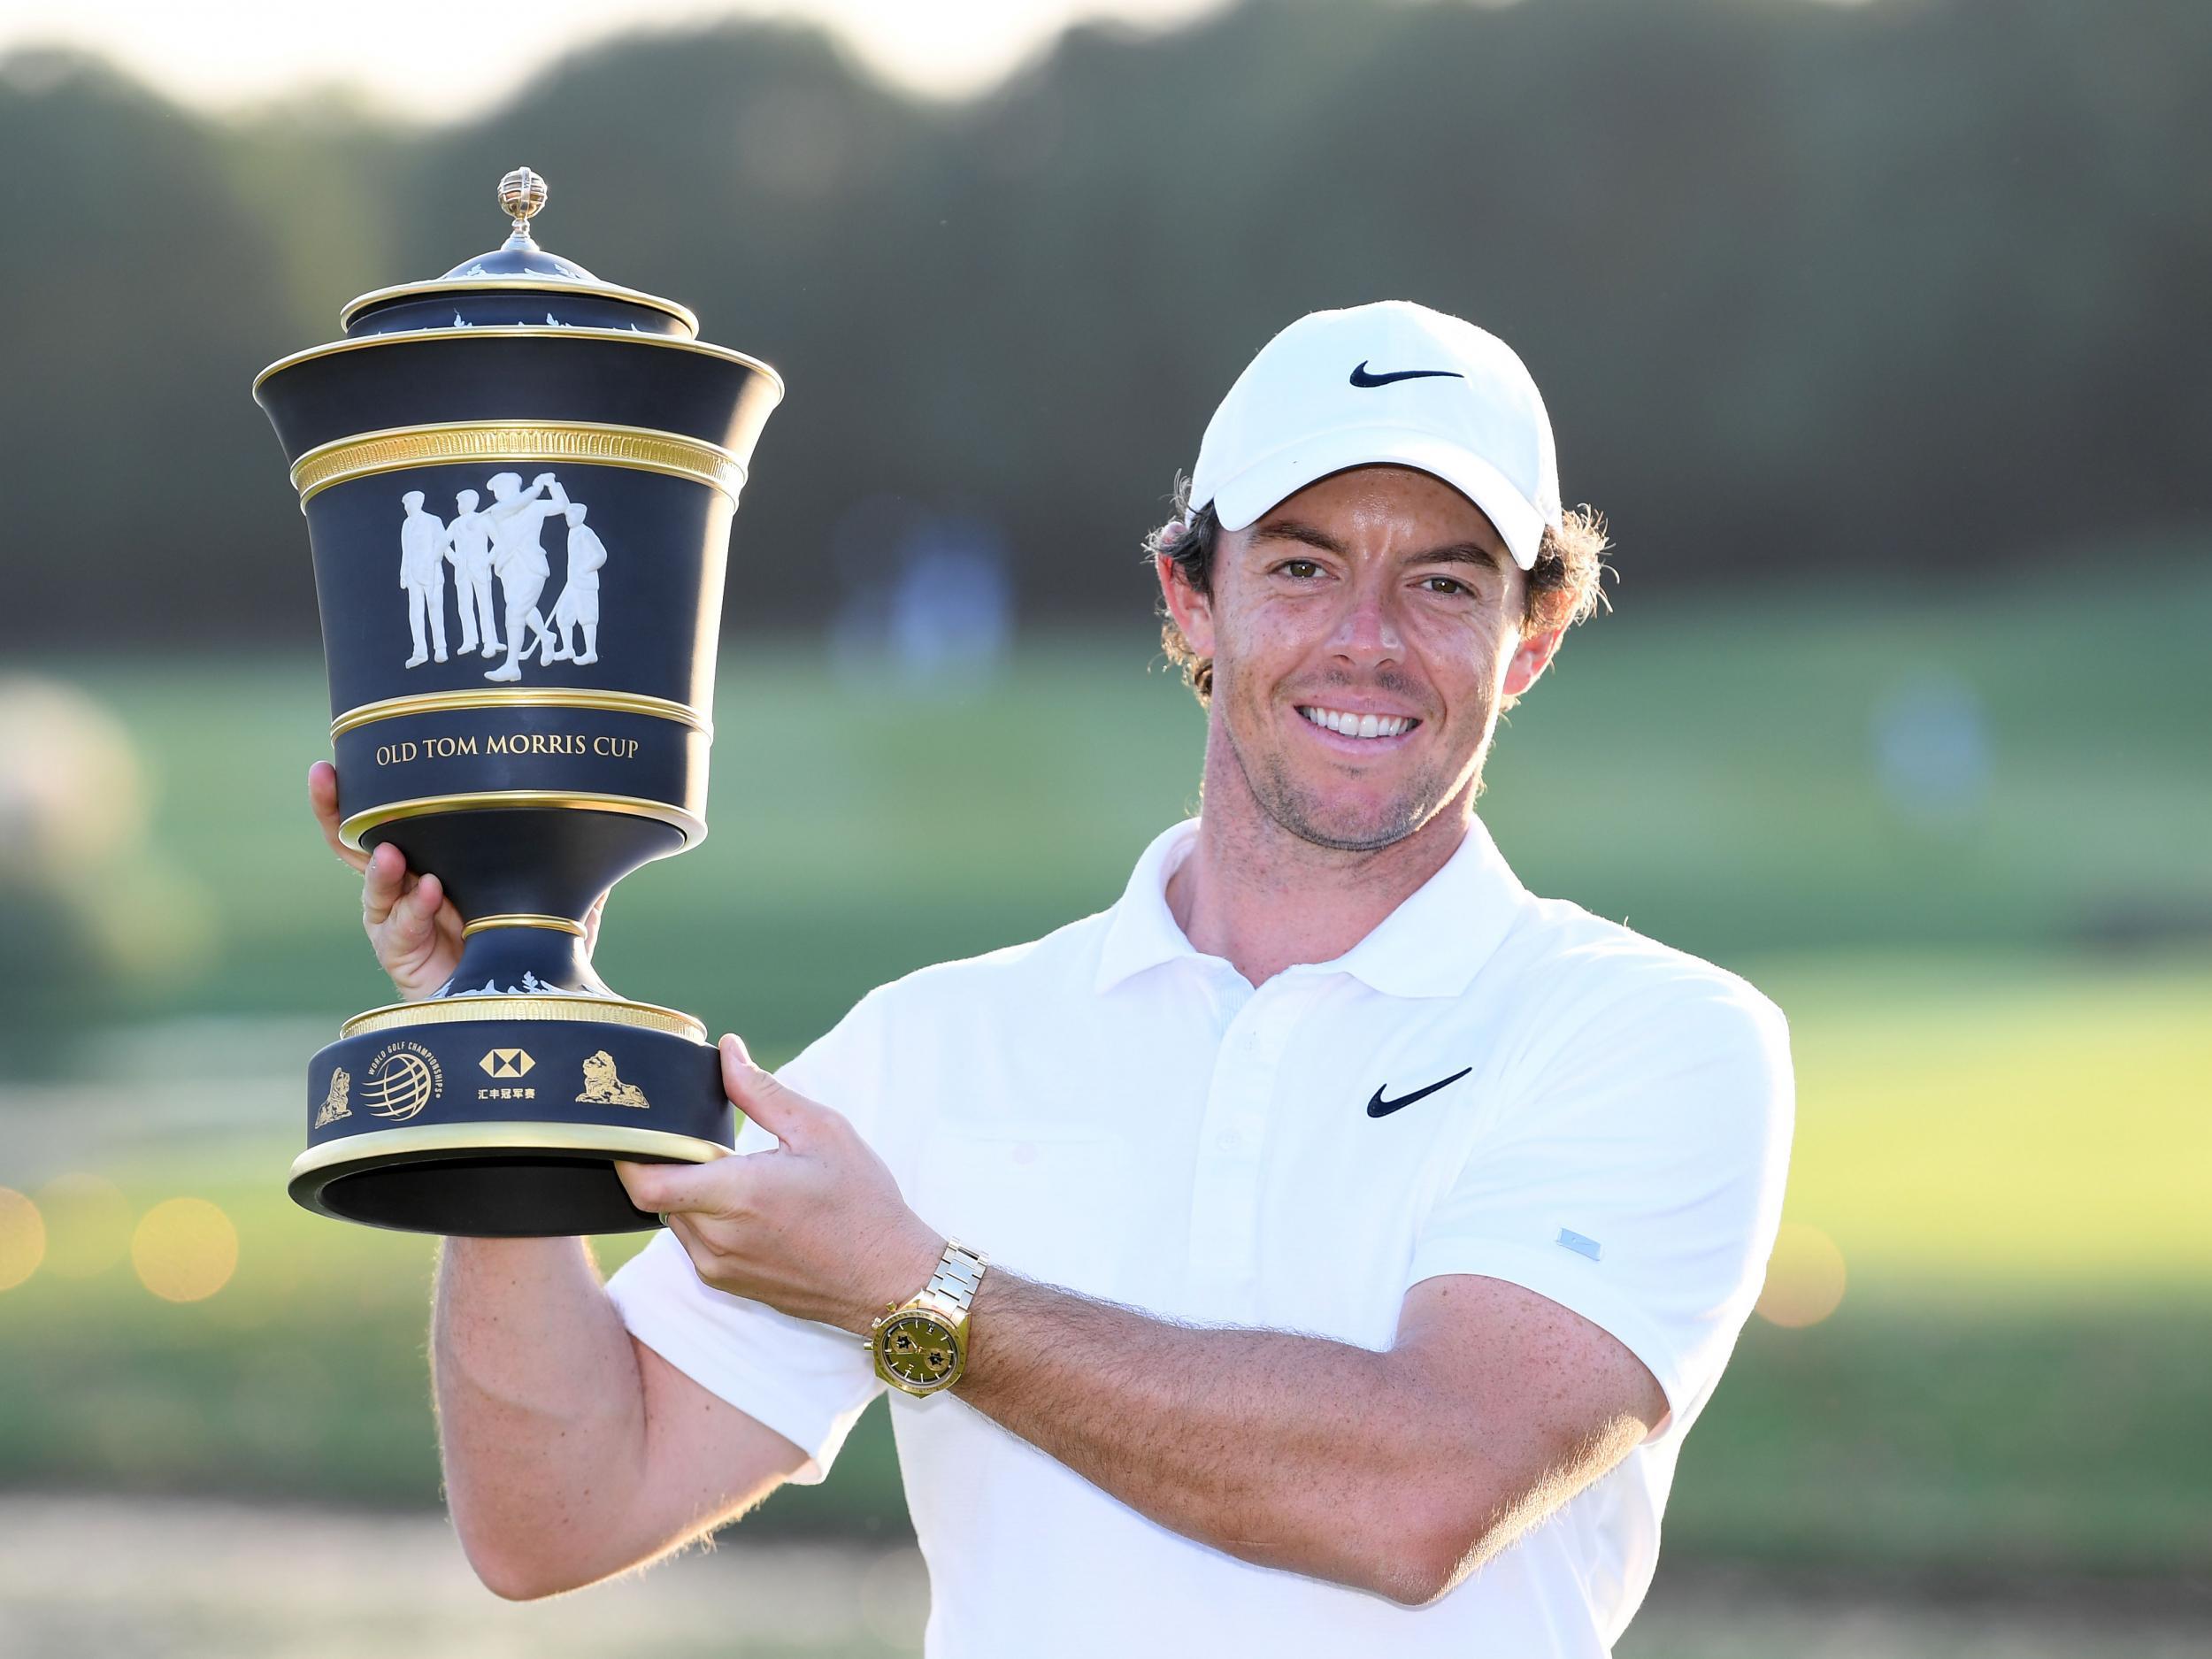 Rory McIlroy wins HSBC Champions